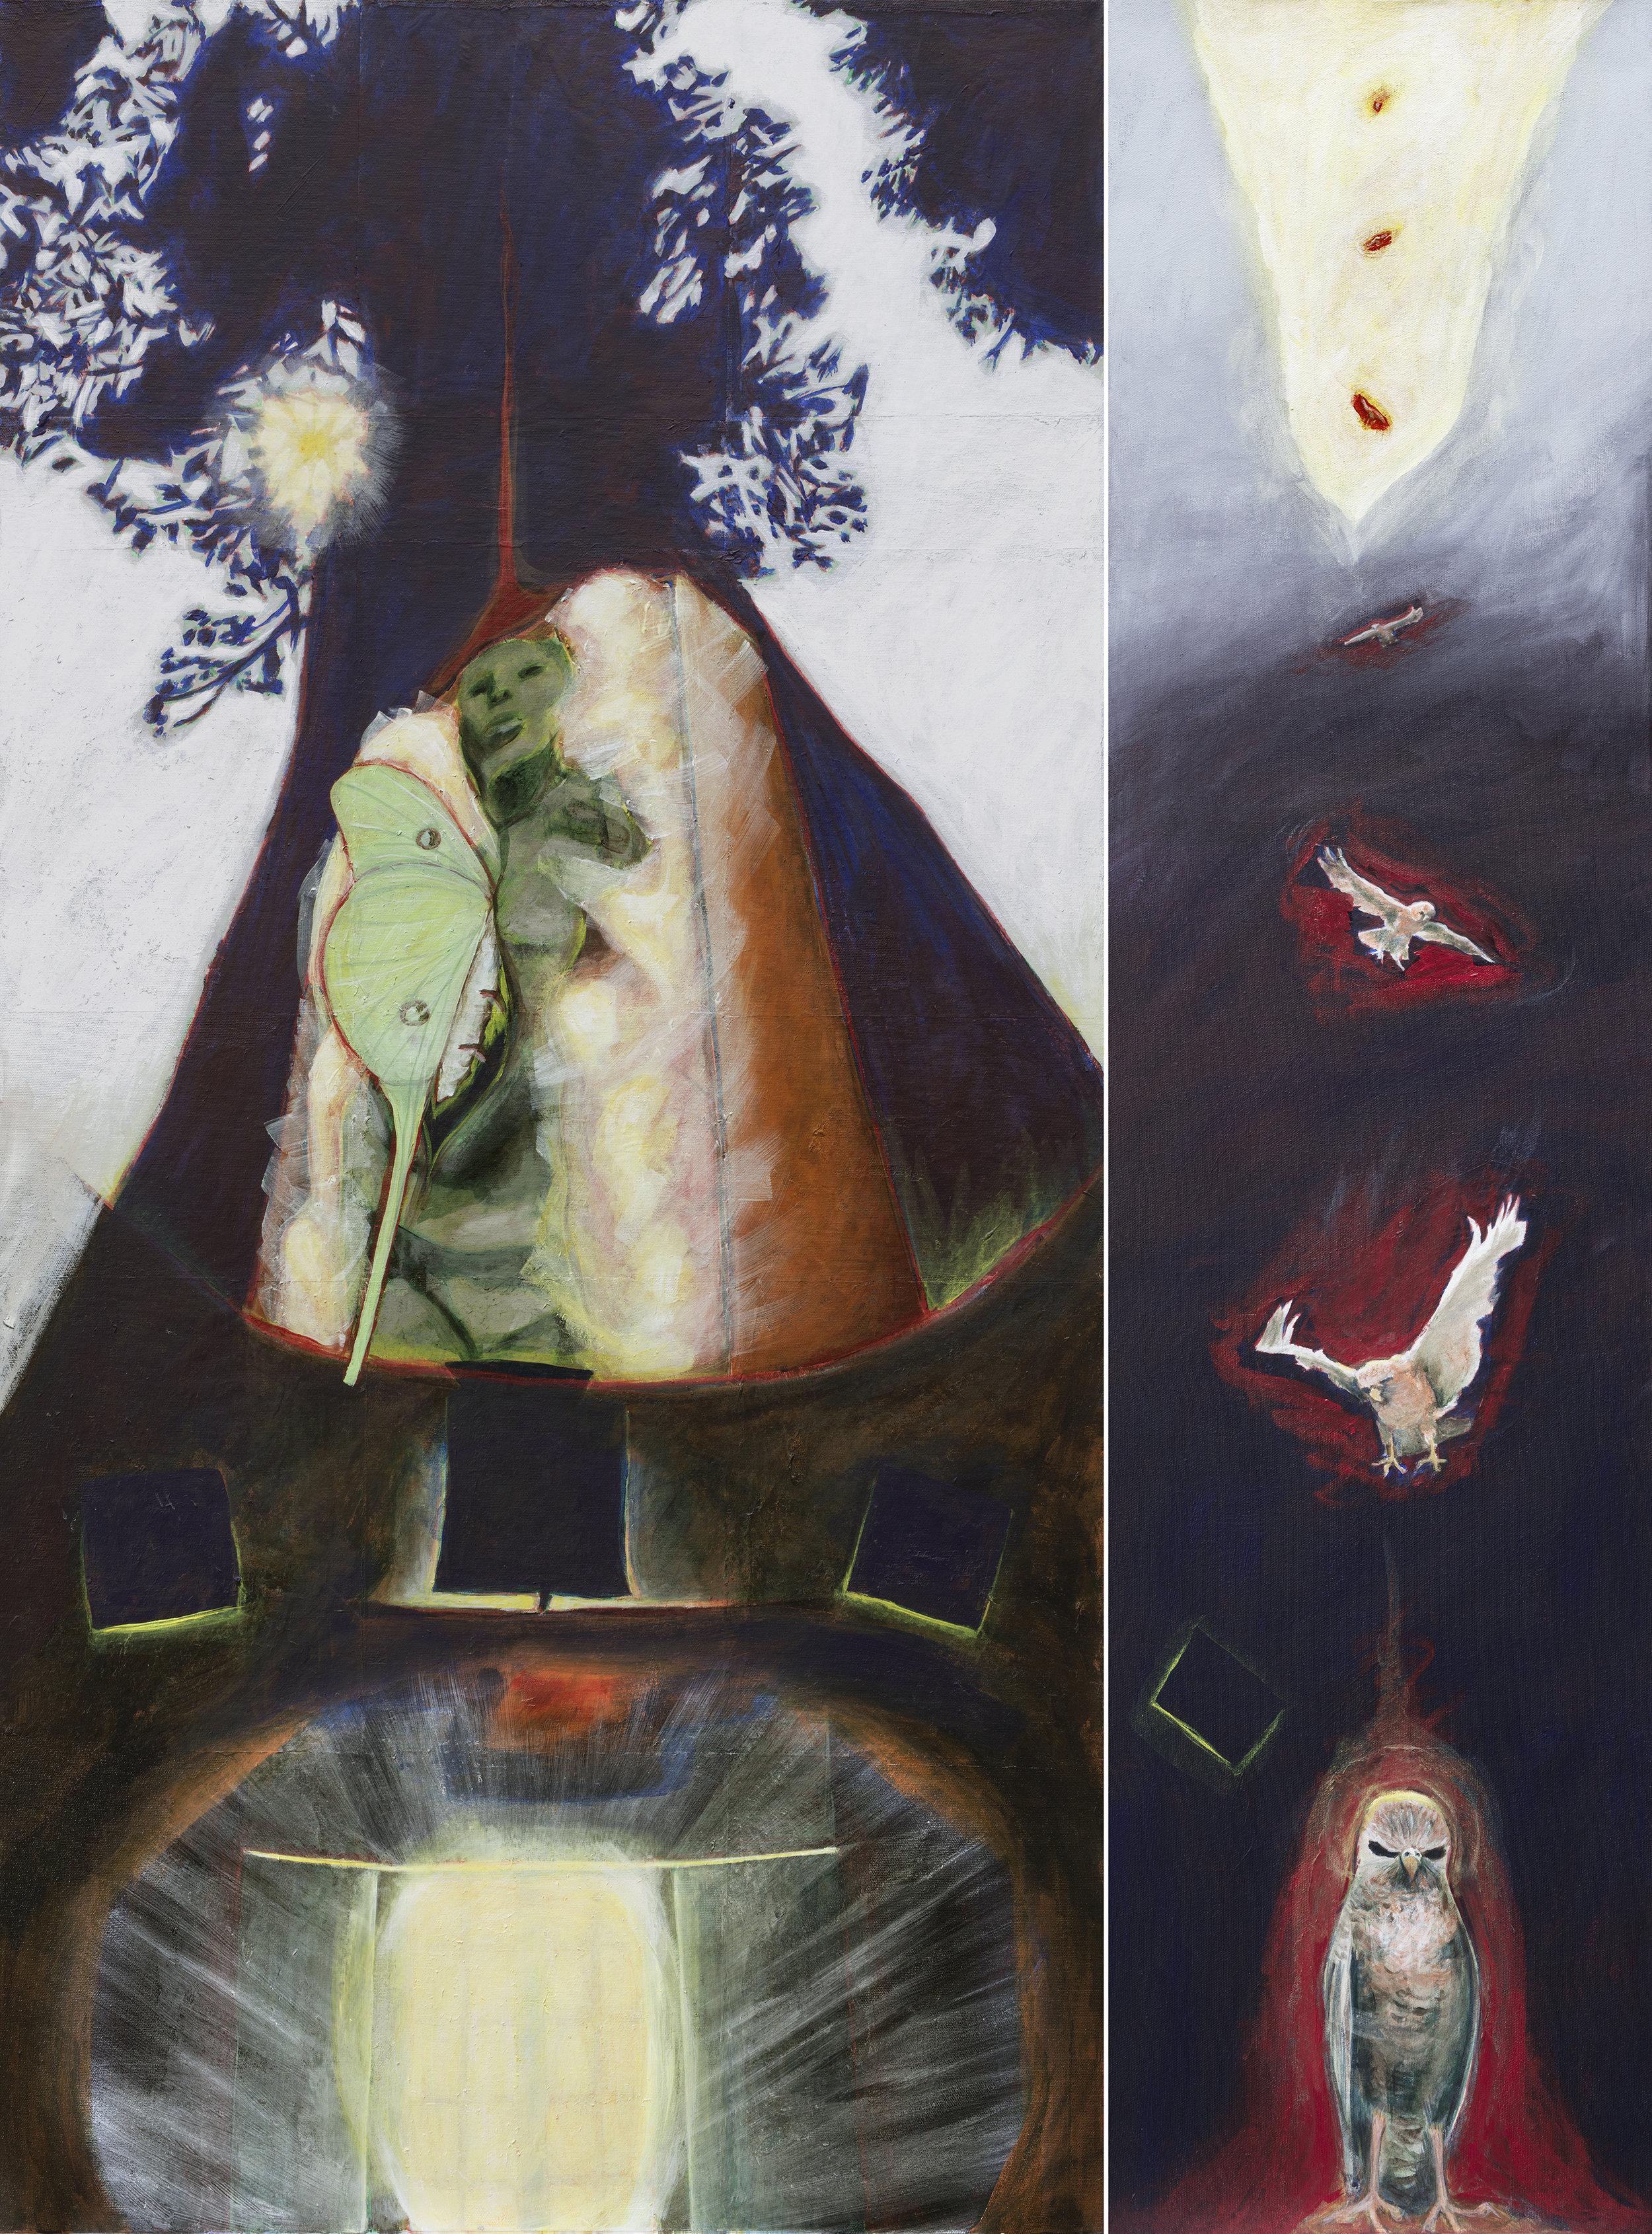 sybil-archibald-transformation-diptych-acrylic-painting.jpg